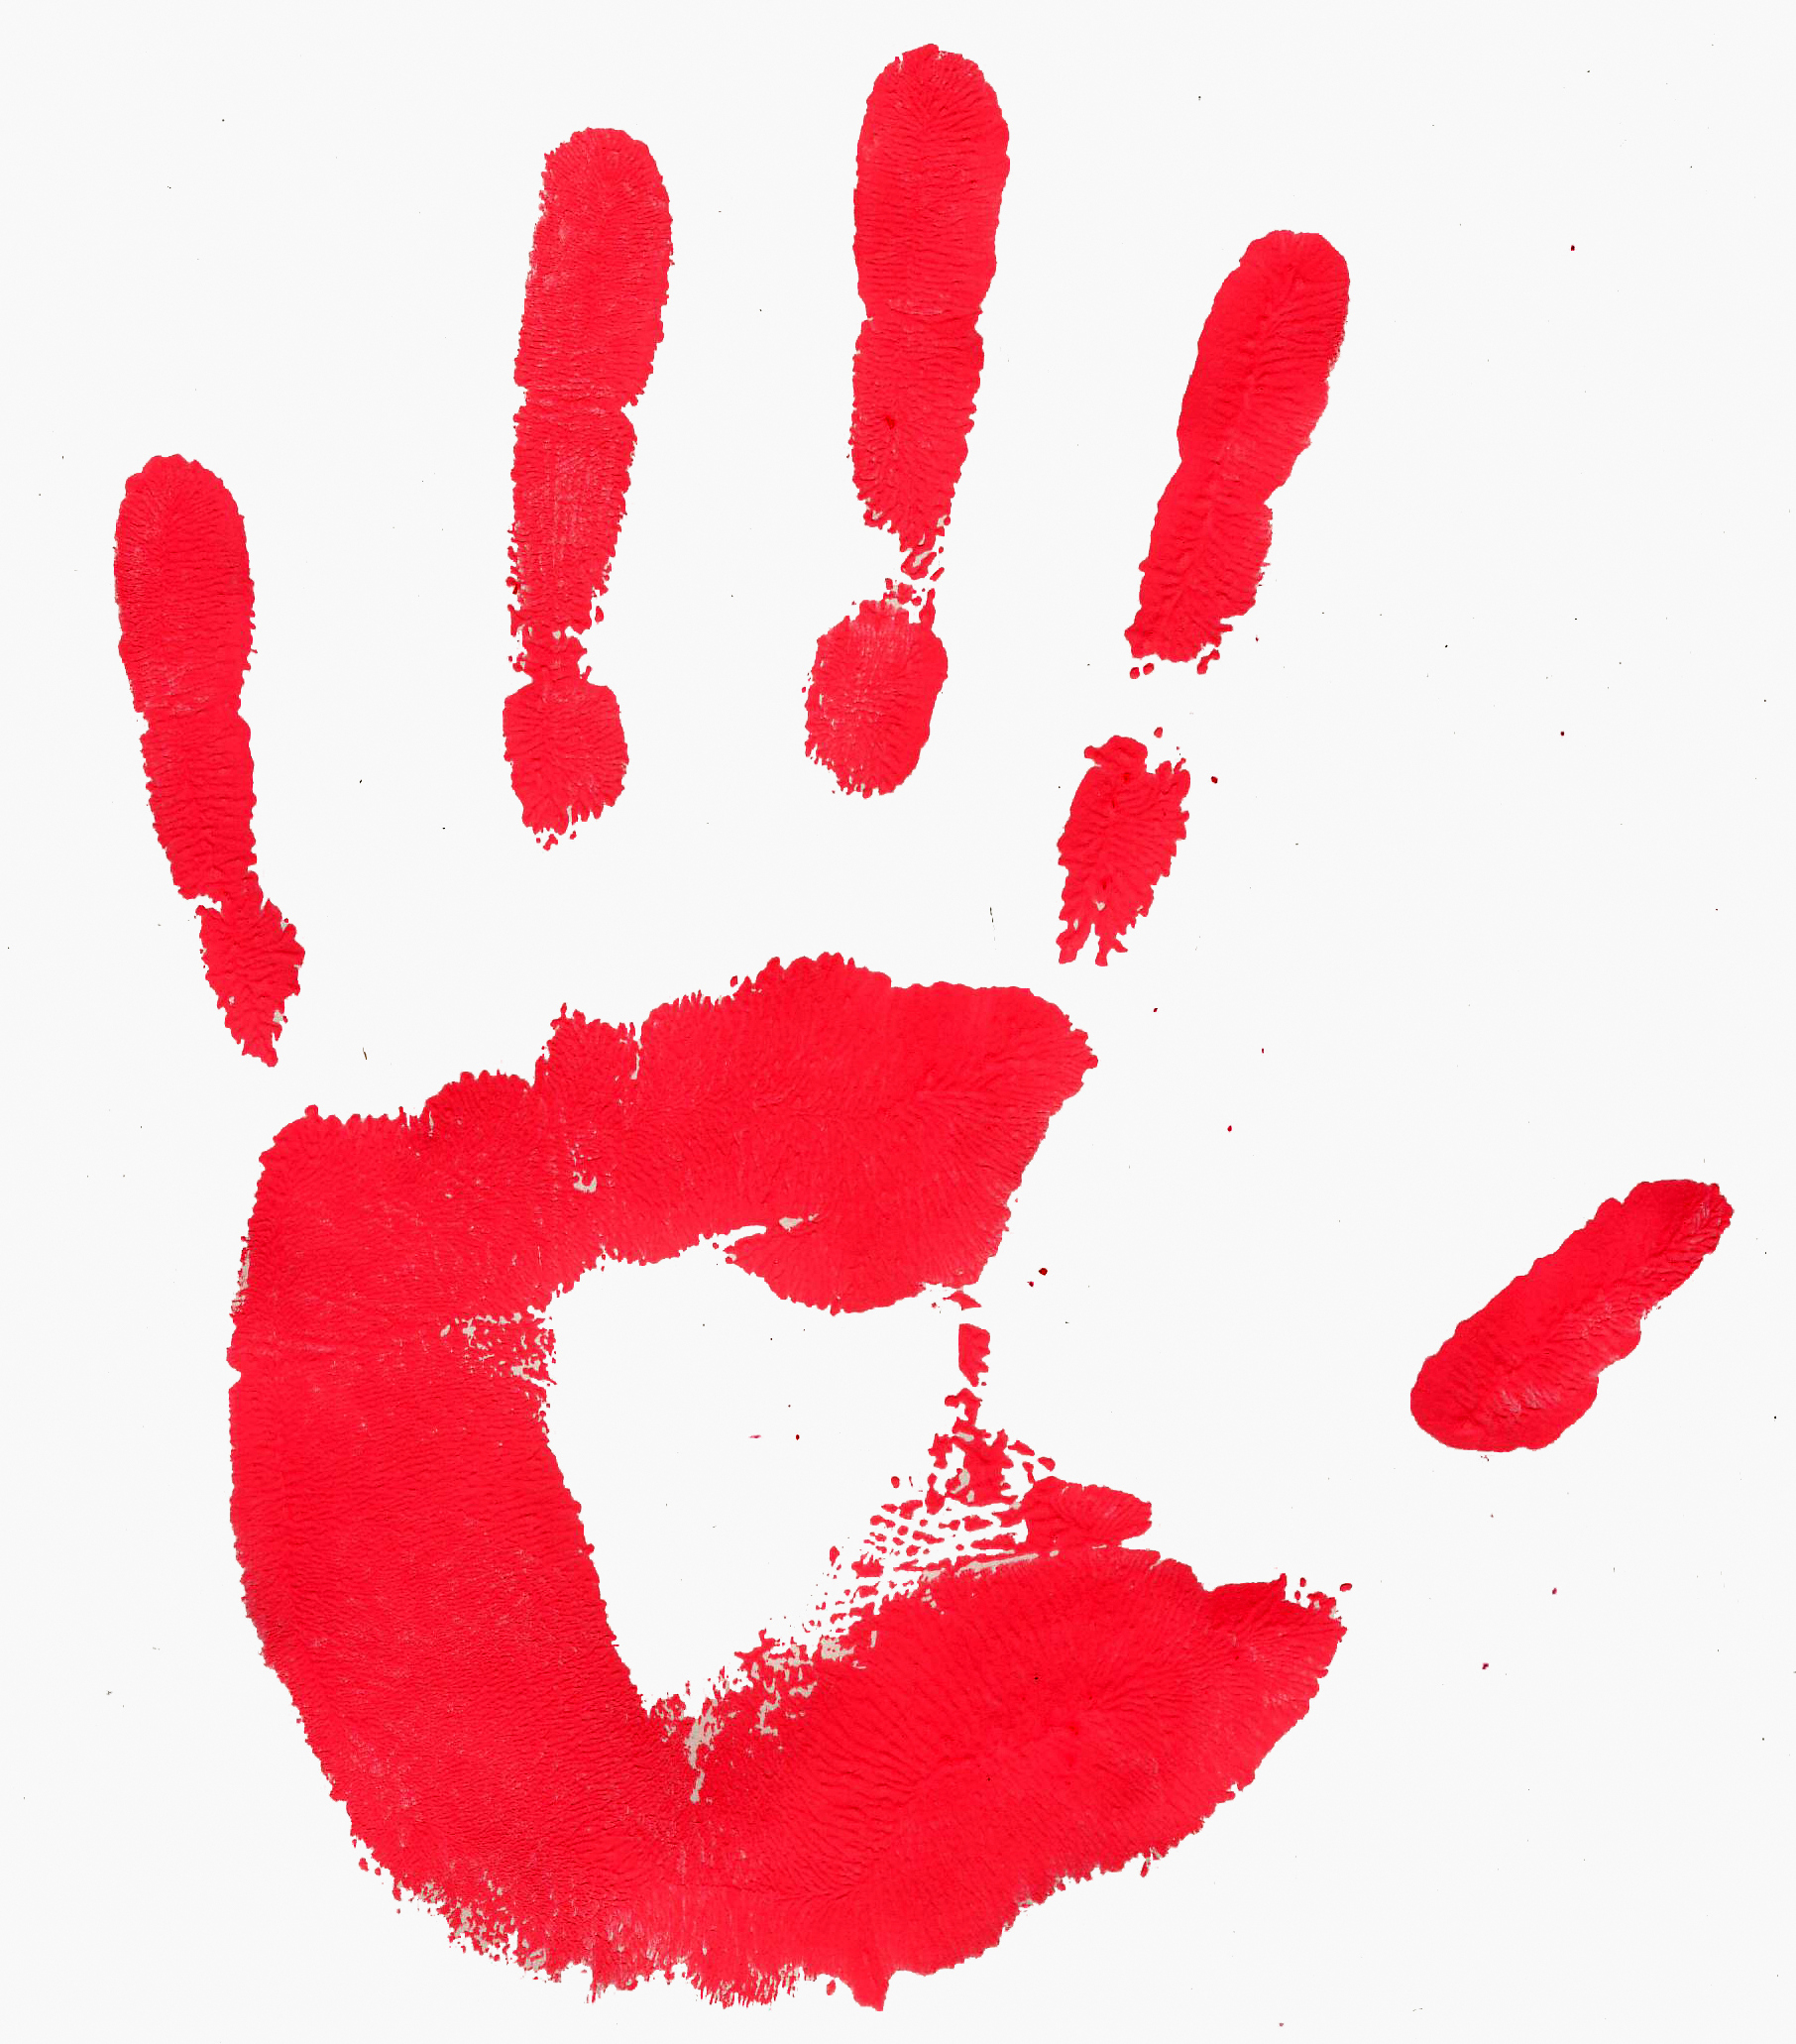 Red Hand Day, Aktion Rote Hand, Logo   Bild (Ausschnitt): © Aktion Rote Hand - www.aktion-rote-hand.de